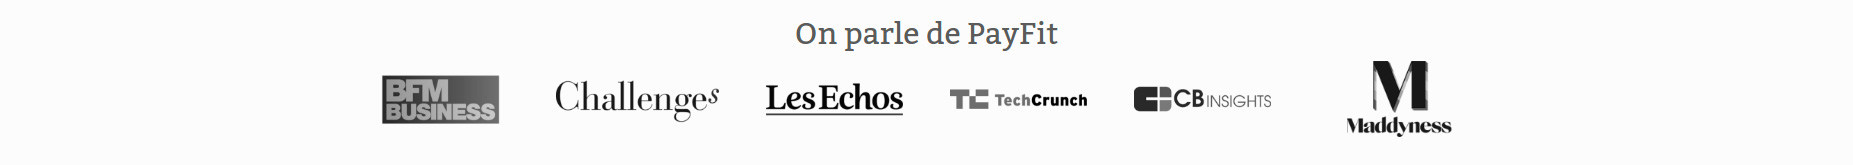 logo presse - Payfit